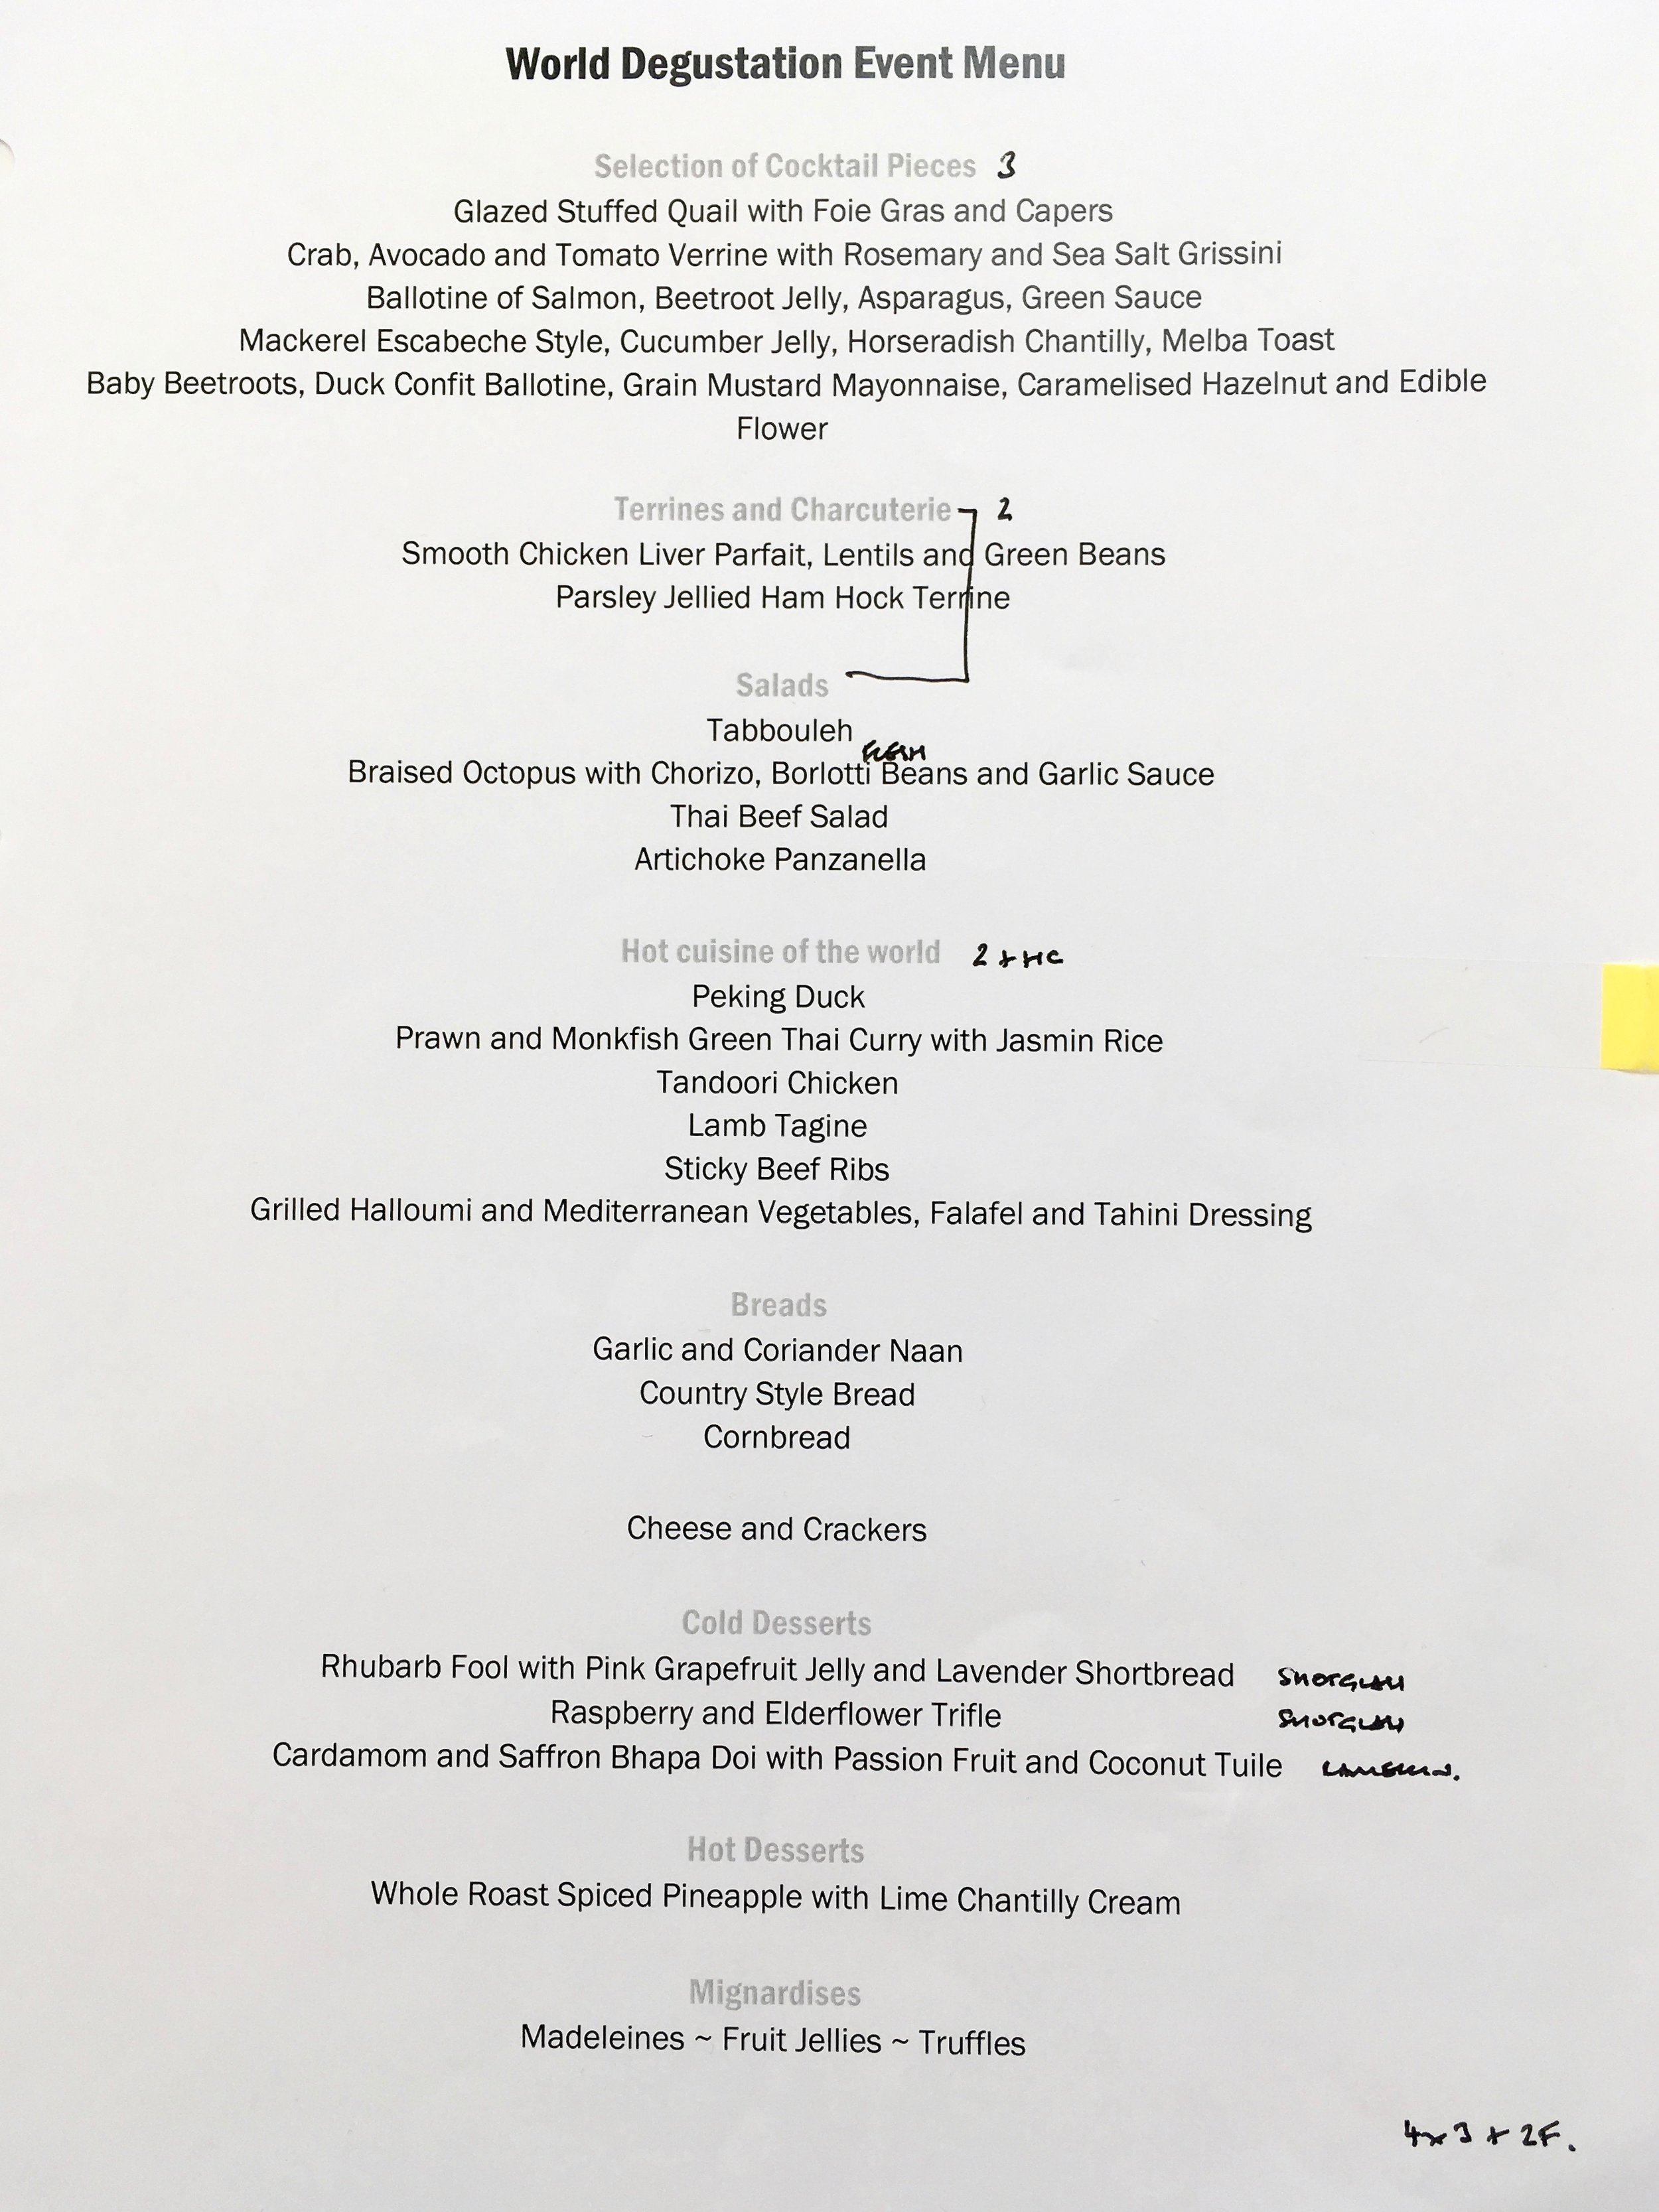 Menu for the Superior Cuisine World Degustation Event